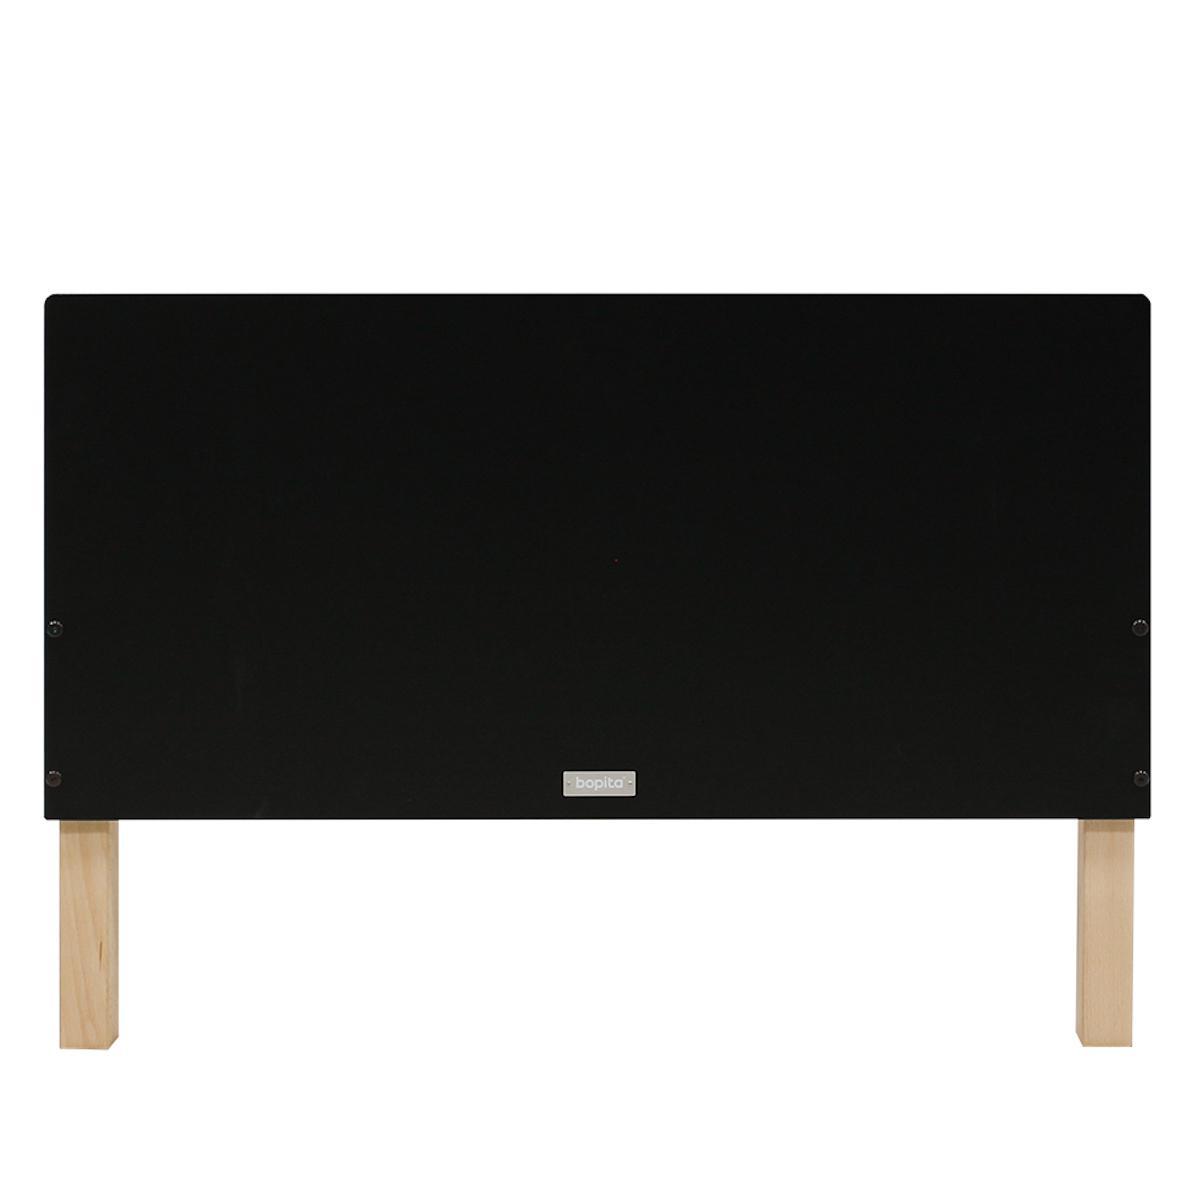 Lit 90x200cm FLORIS Bopita Noir Mat-Naturel